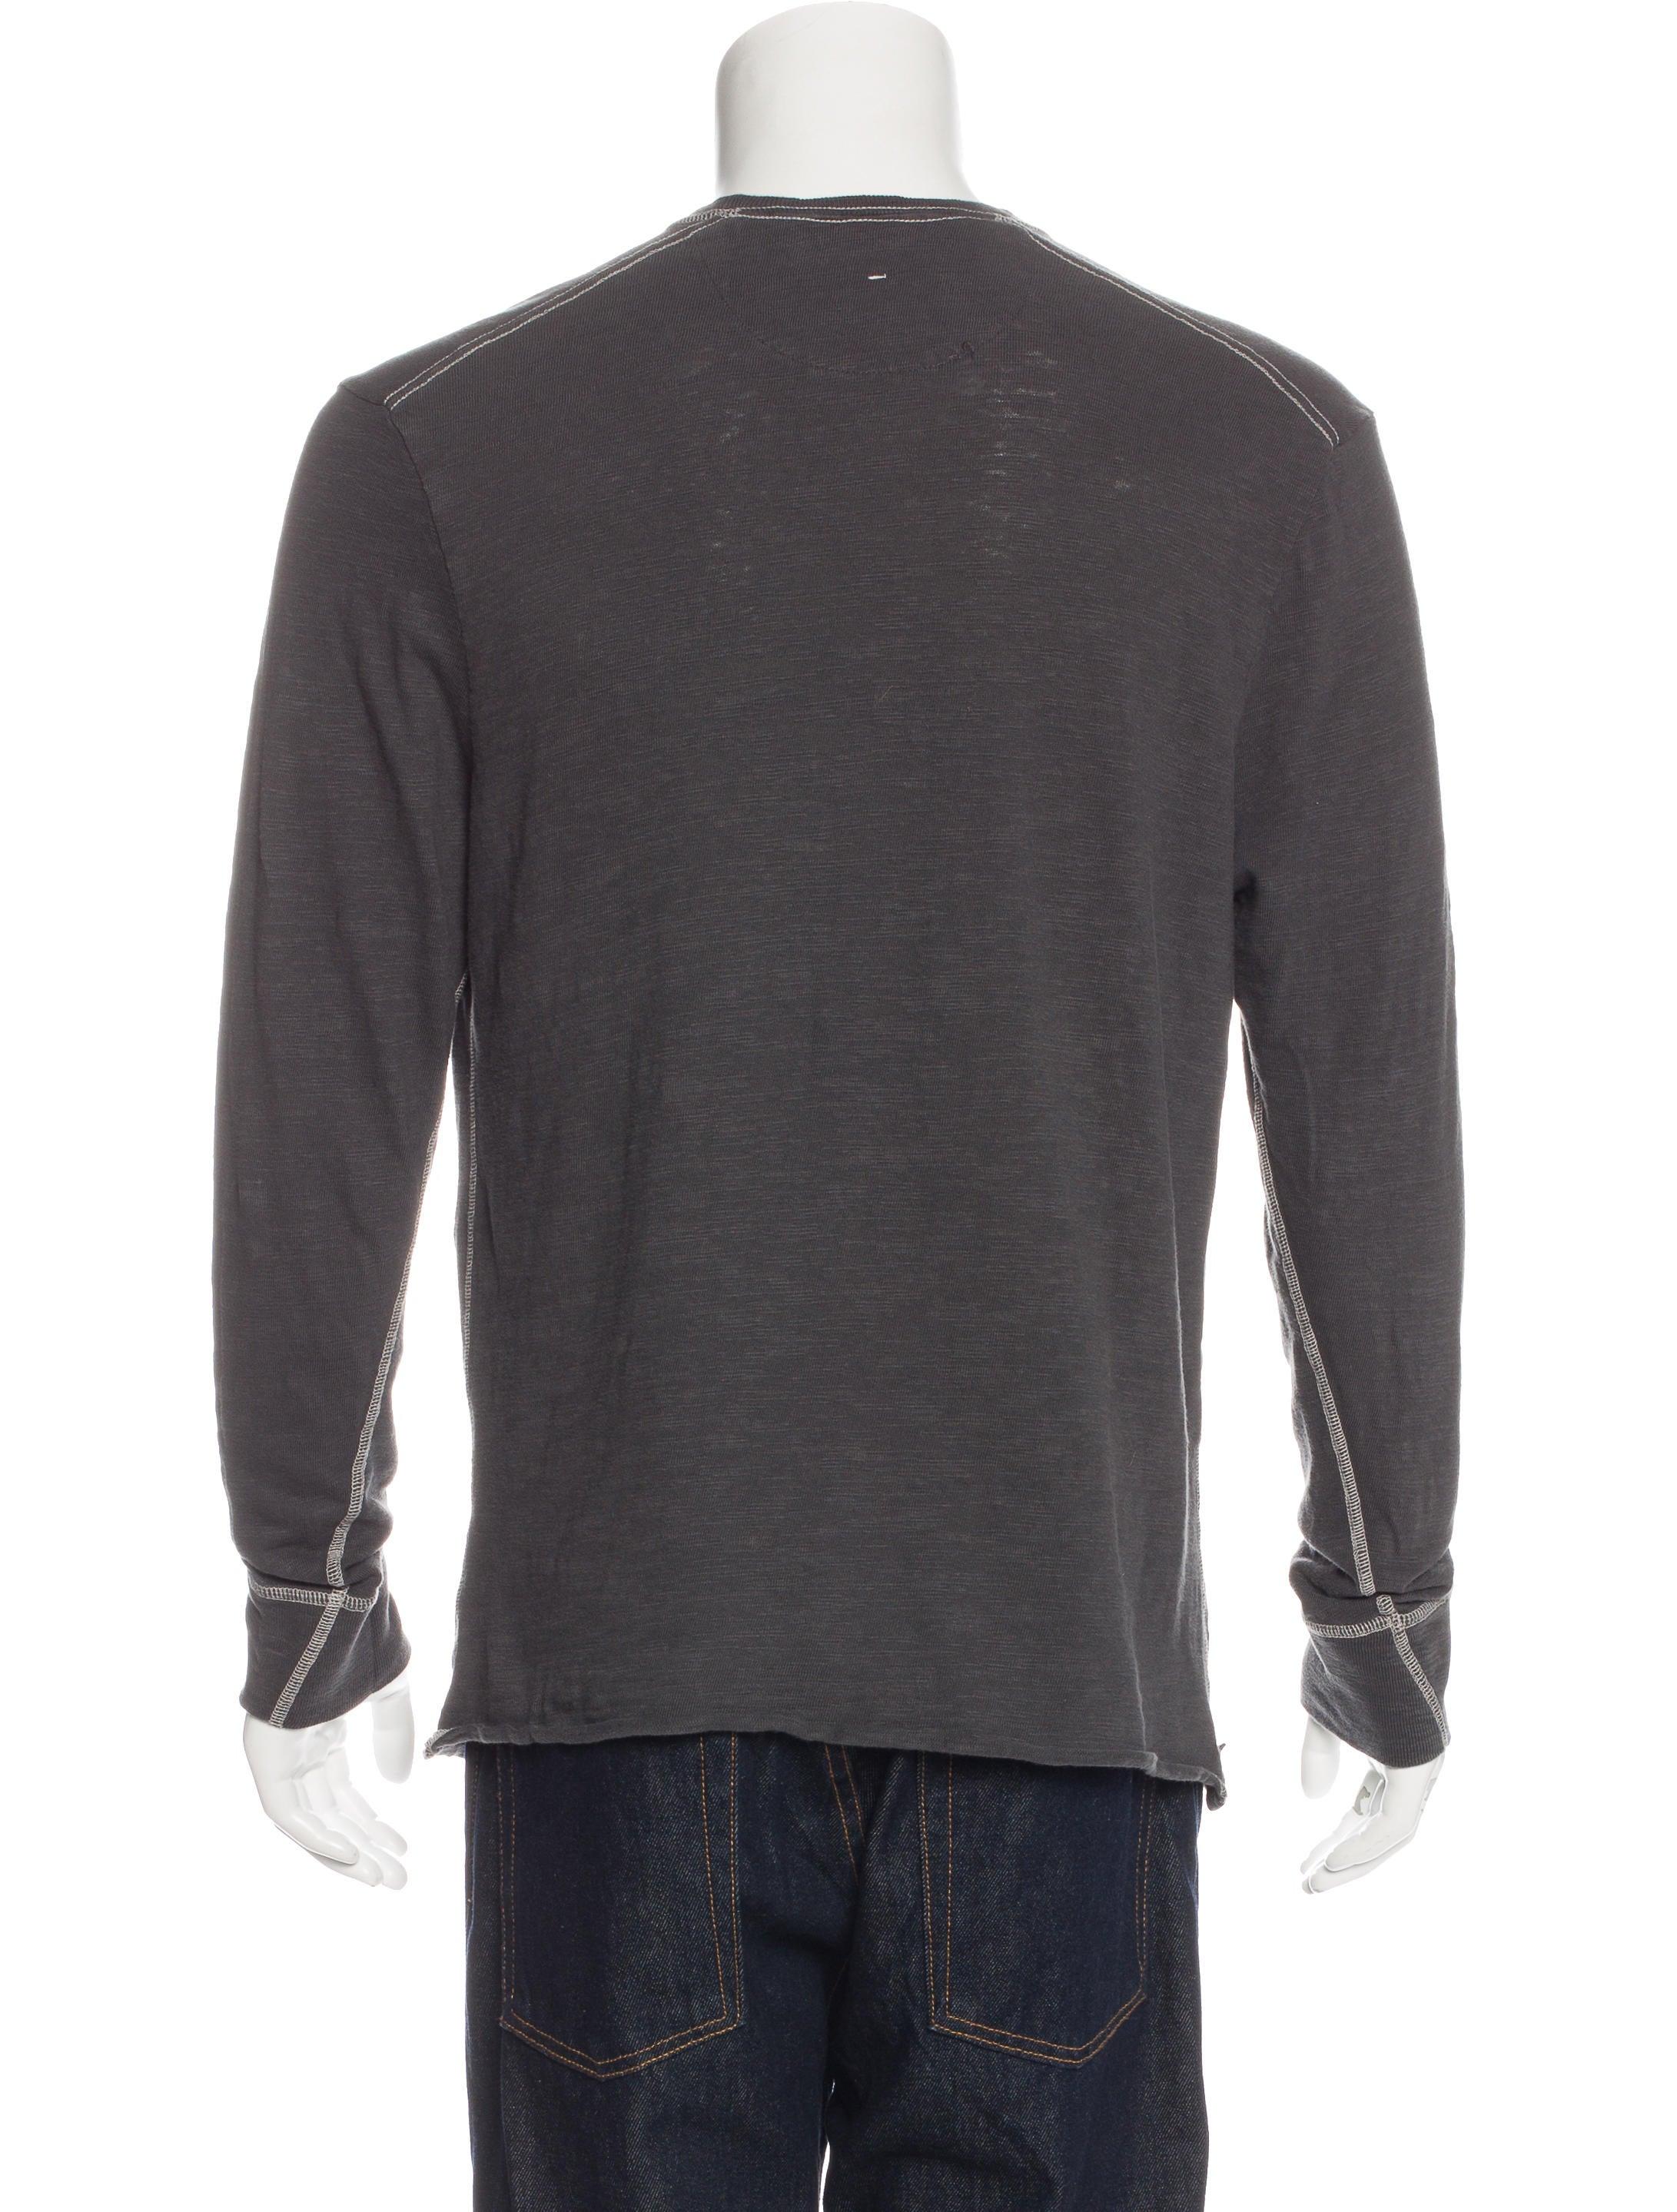 Rag bone crew neck long sleeve t shirt clothing for Rag bone shirt